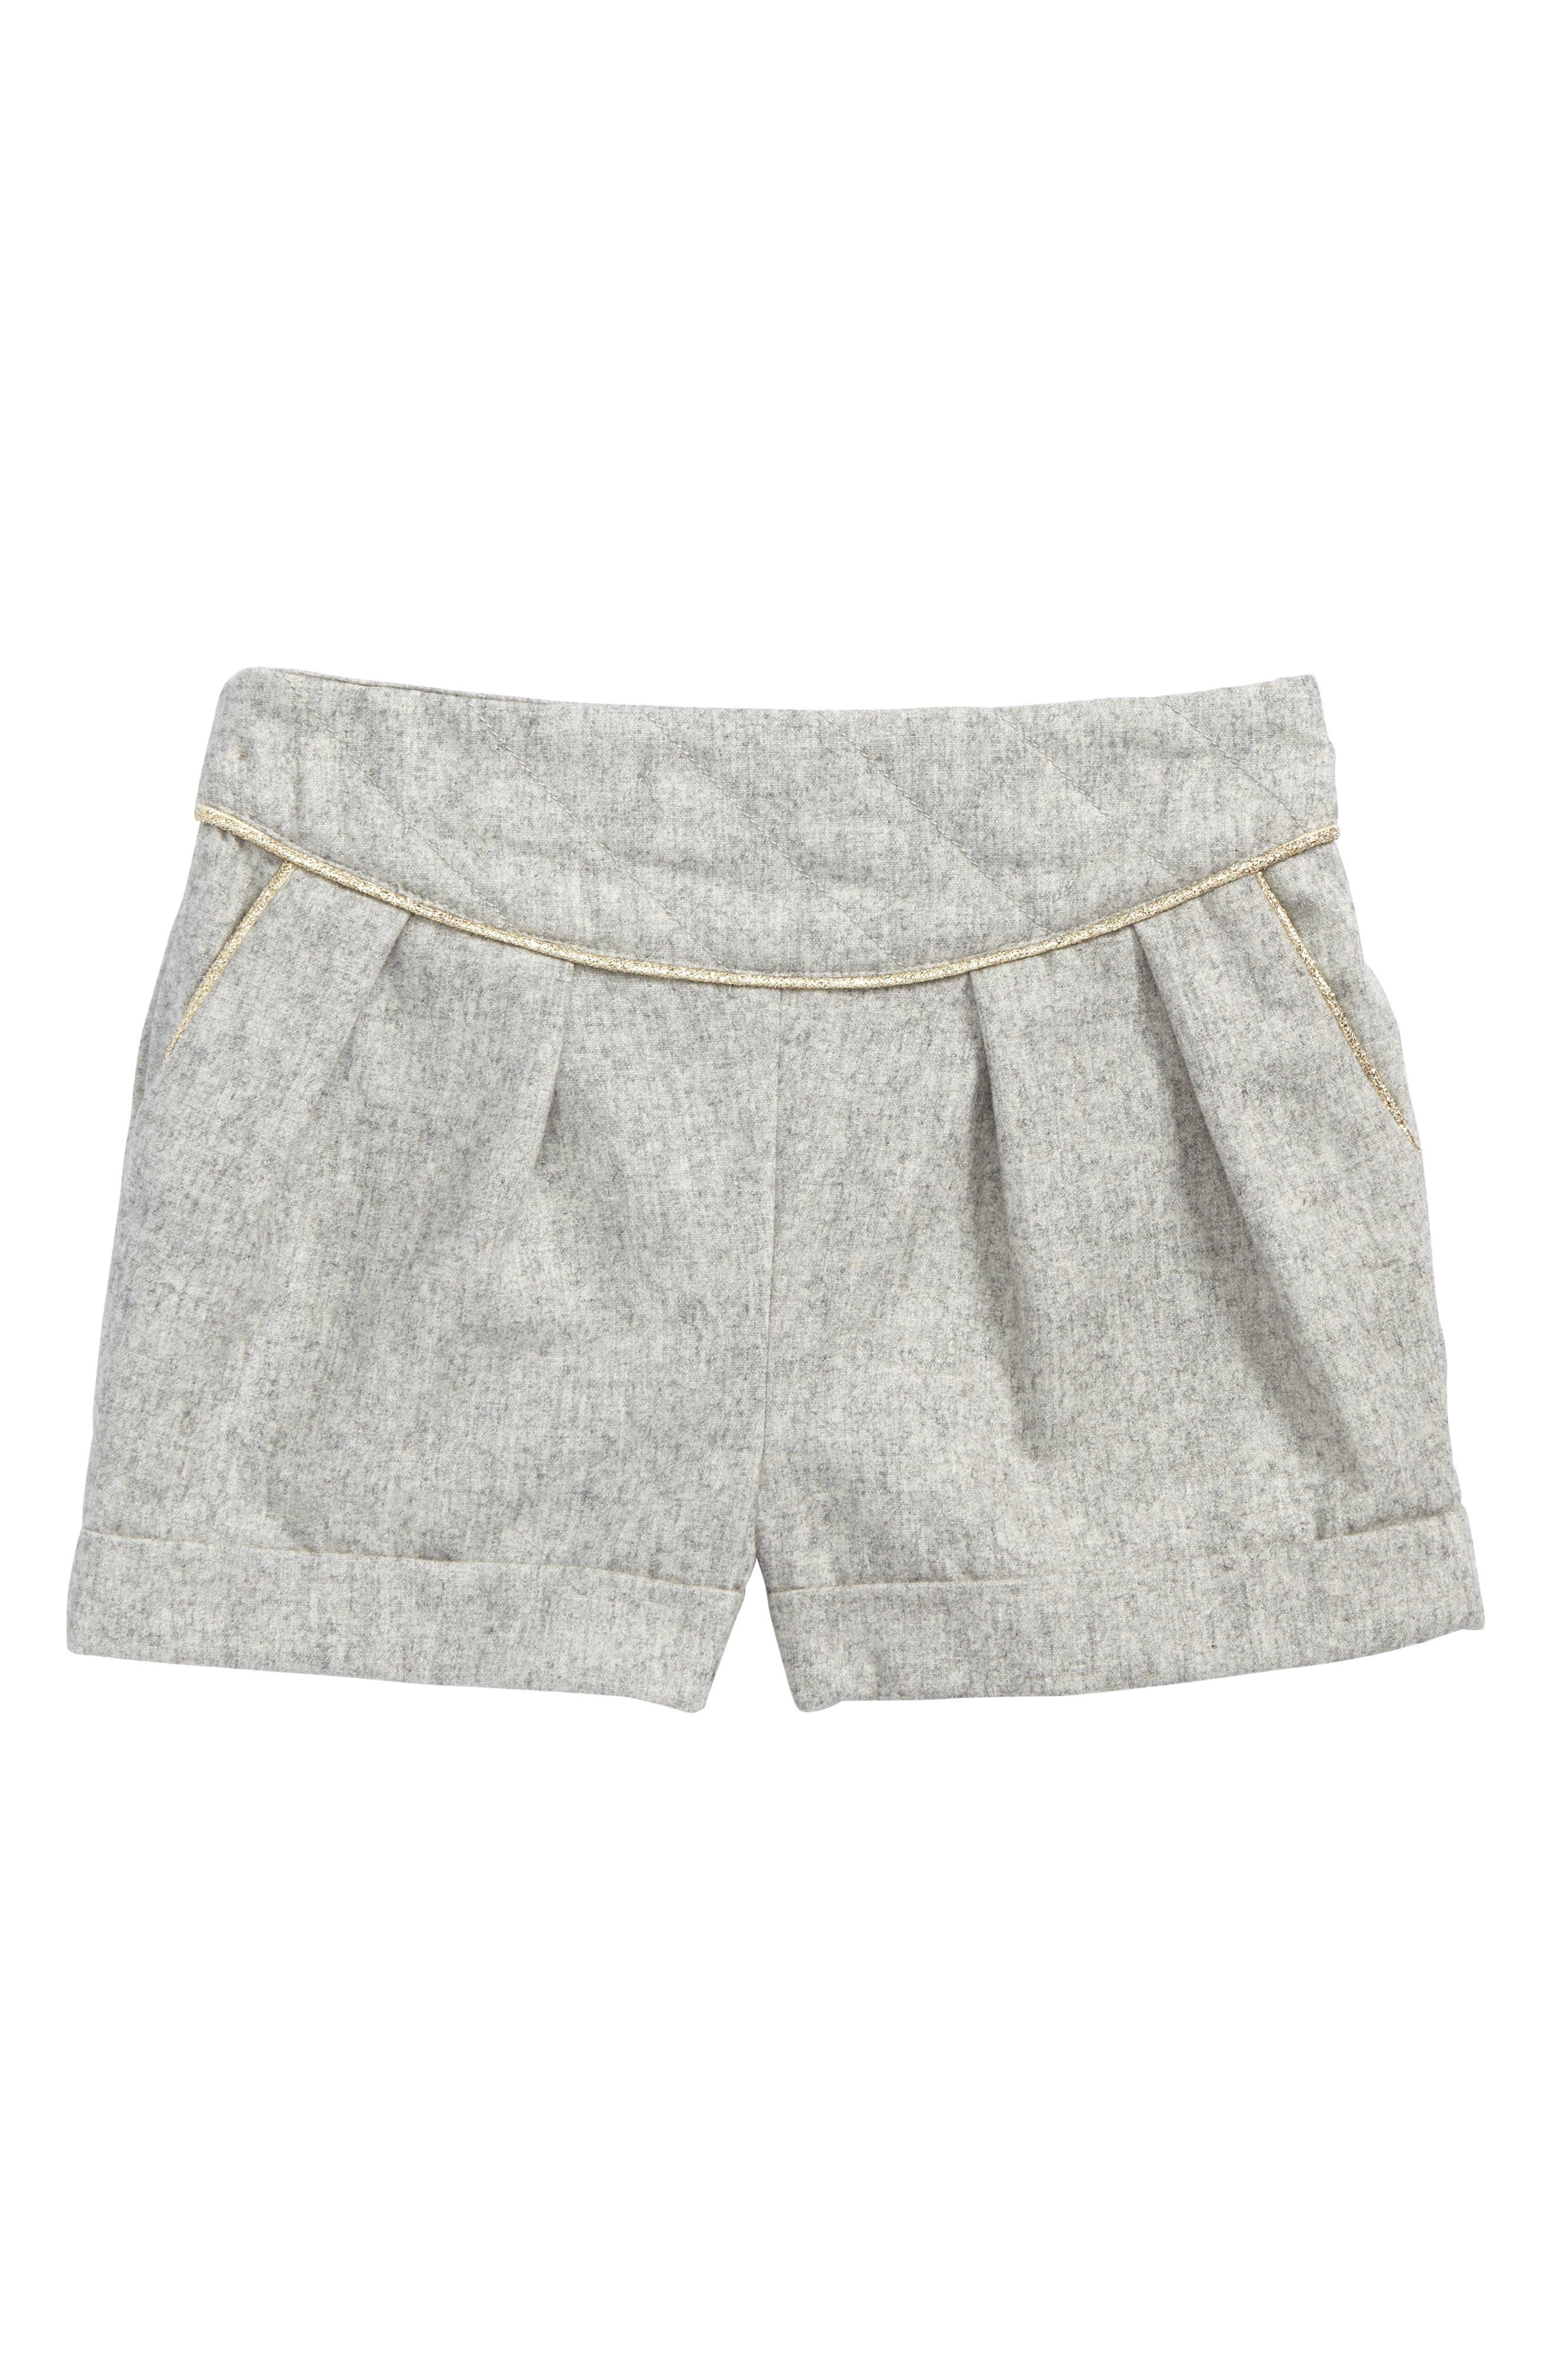 Diamond Shorts,                         Main,                         color, 050